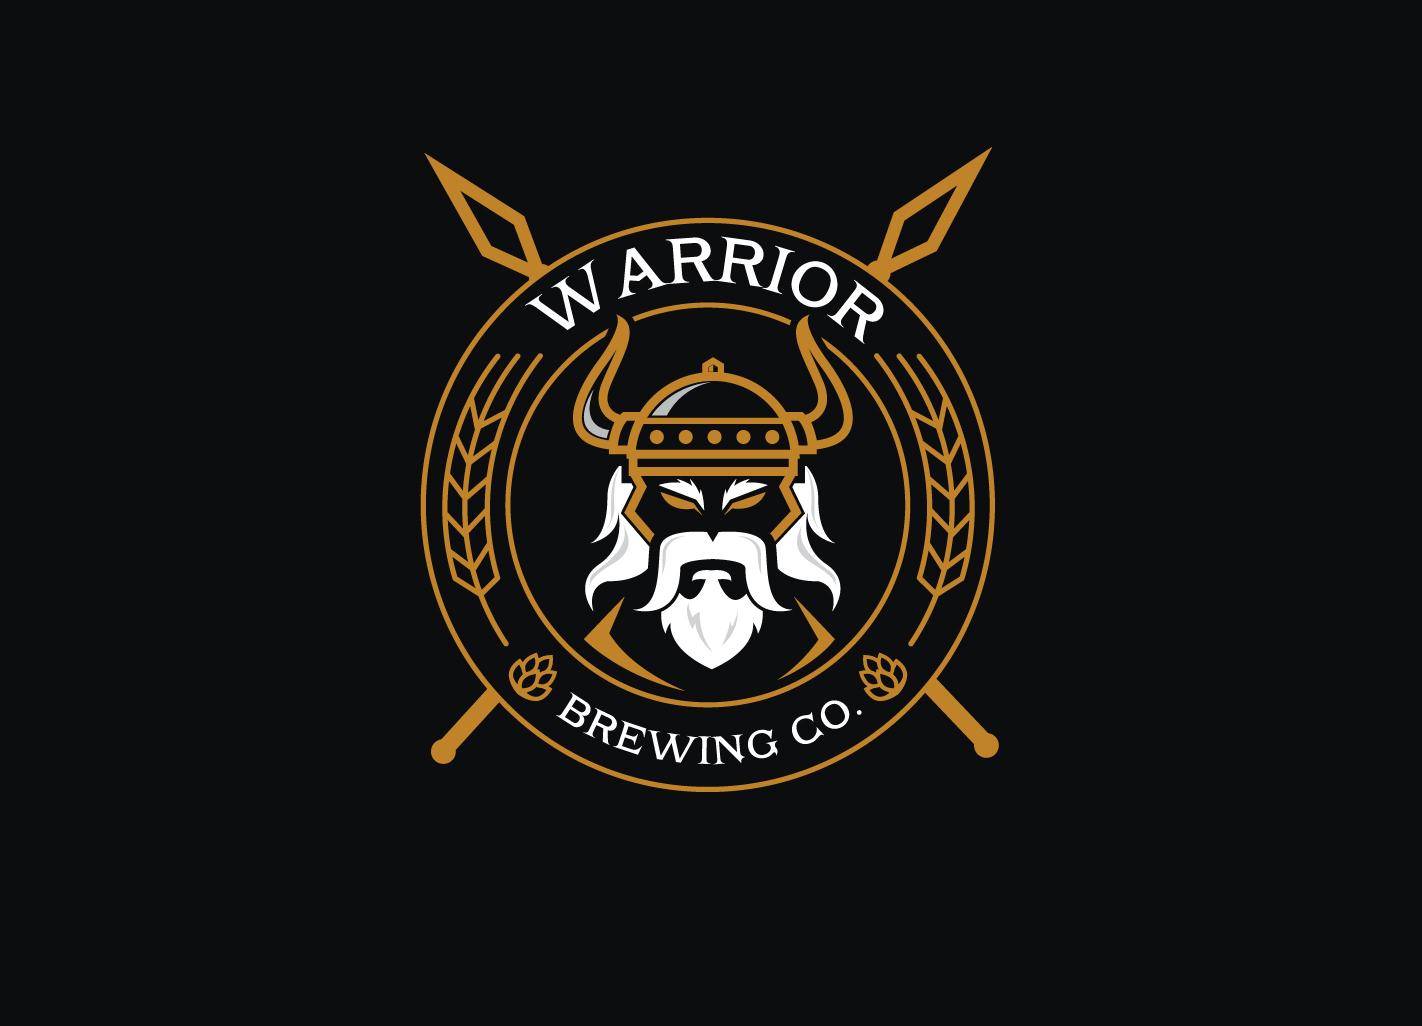 Masculine Modern Brewery Logo Design For Warrior Brewing Co